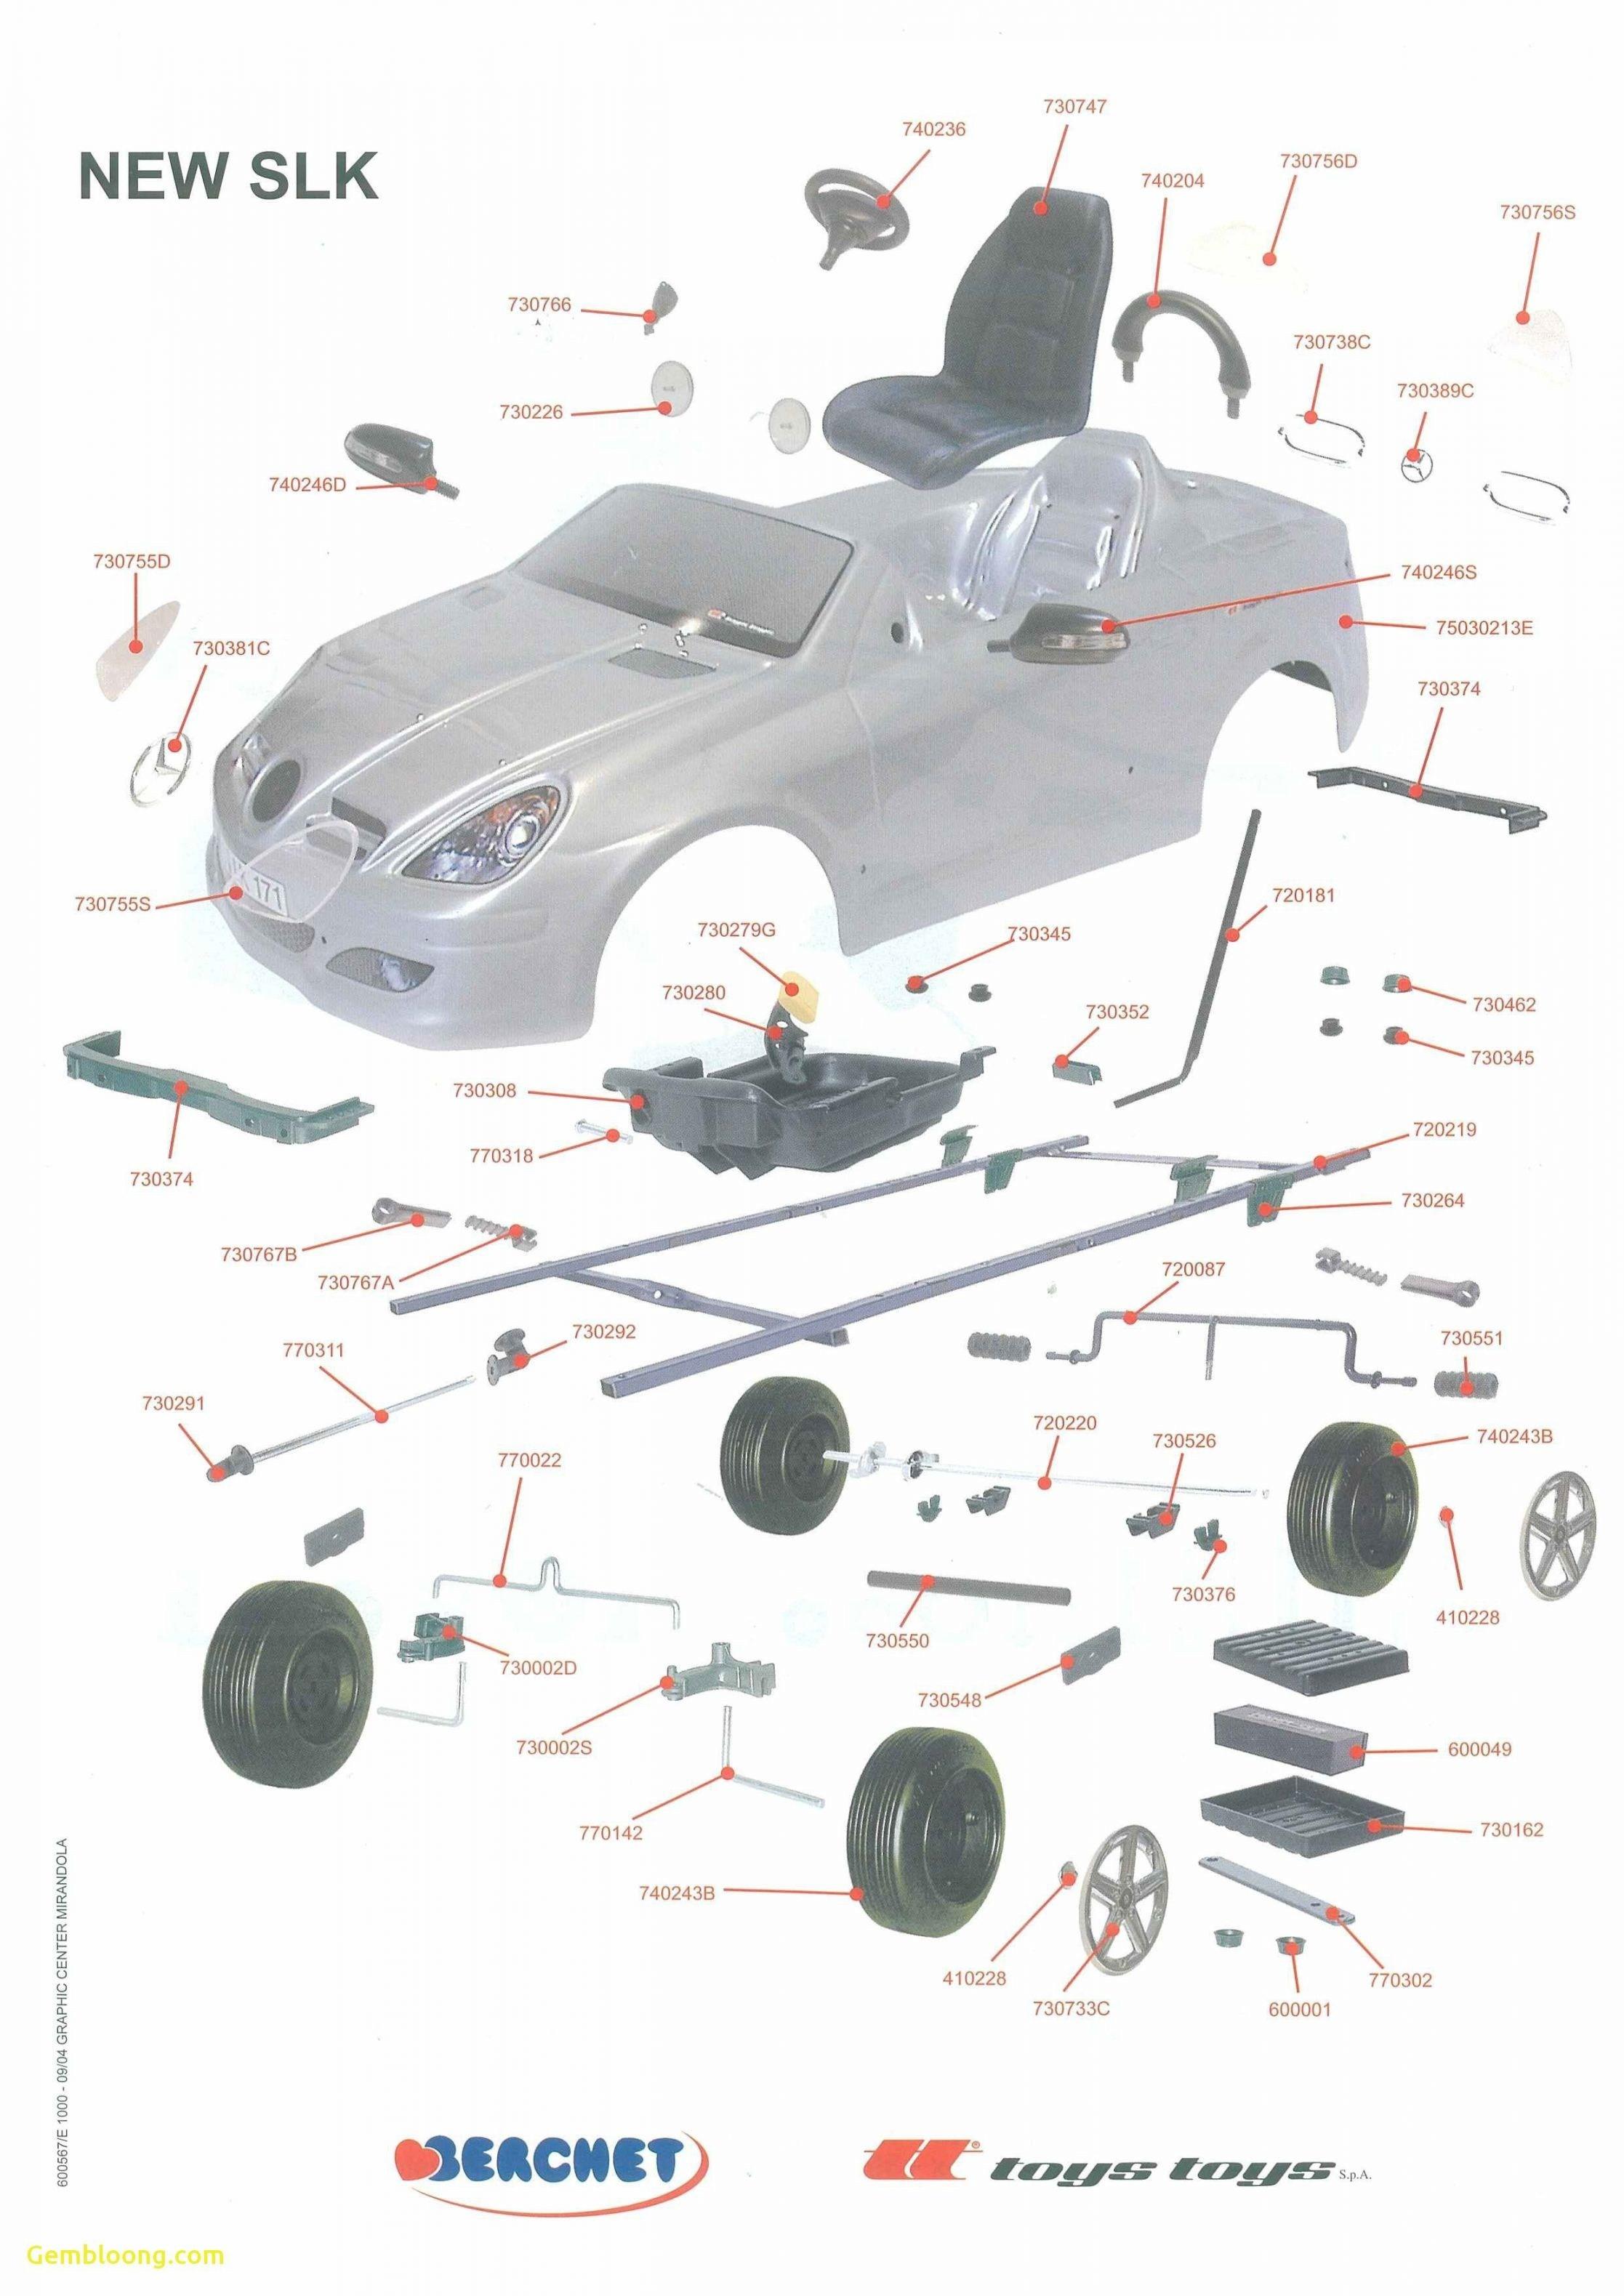 Car Body Parts Diagram Car Body Parts Names Diagram Of Car Body Parts Diagram